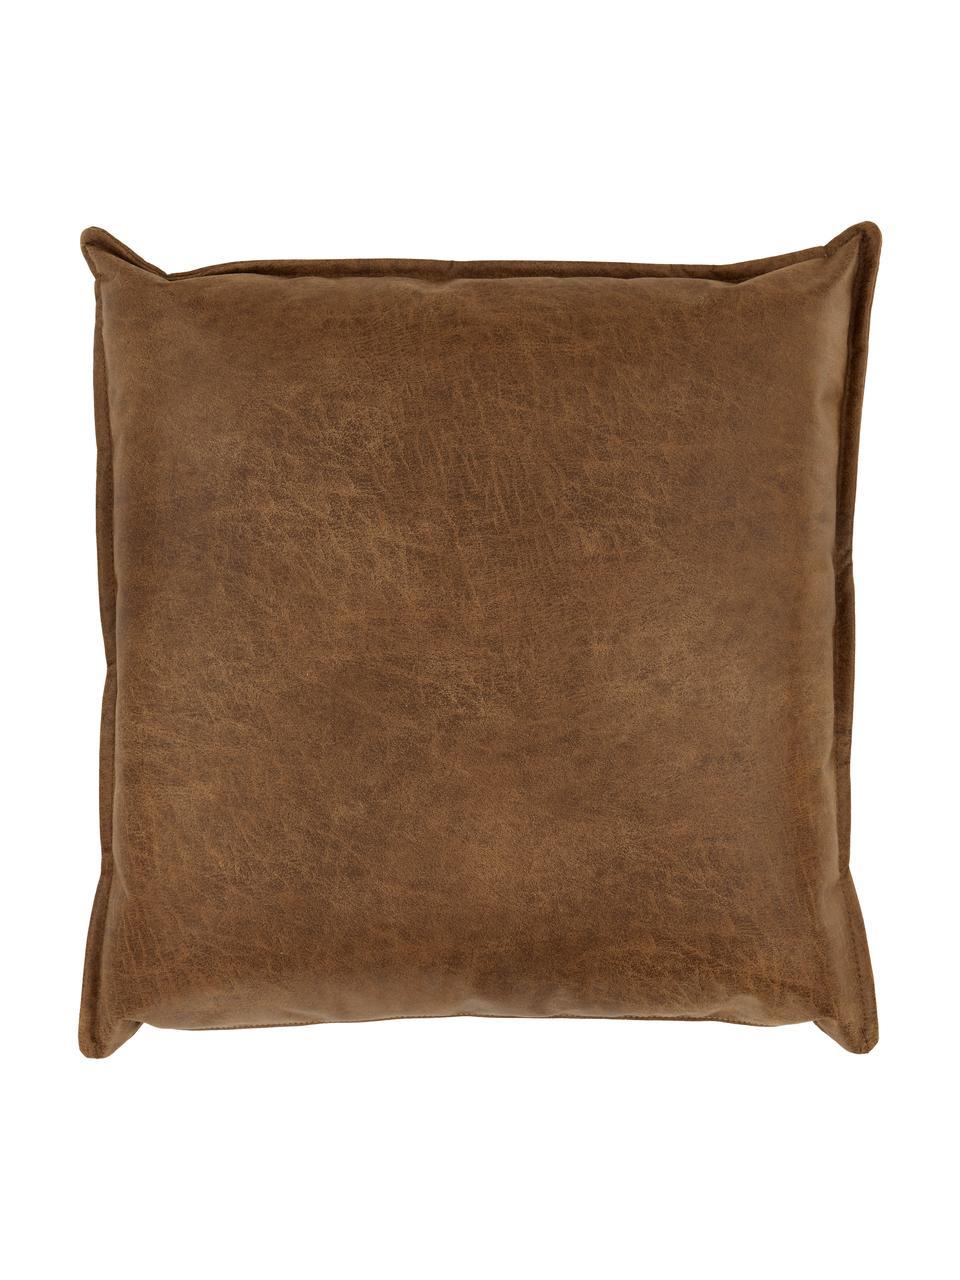 Sofa-Kissen Lennon in Braun aus recyceltem Leder, Bezug: Recyceltes Leder (70% Led, Leder Braun, 60 x 60 cm